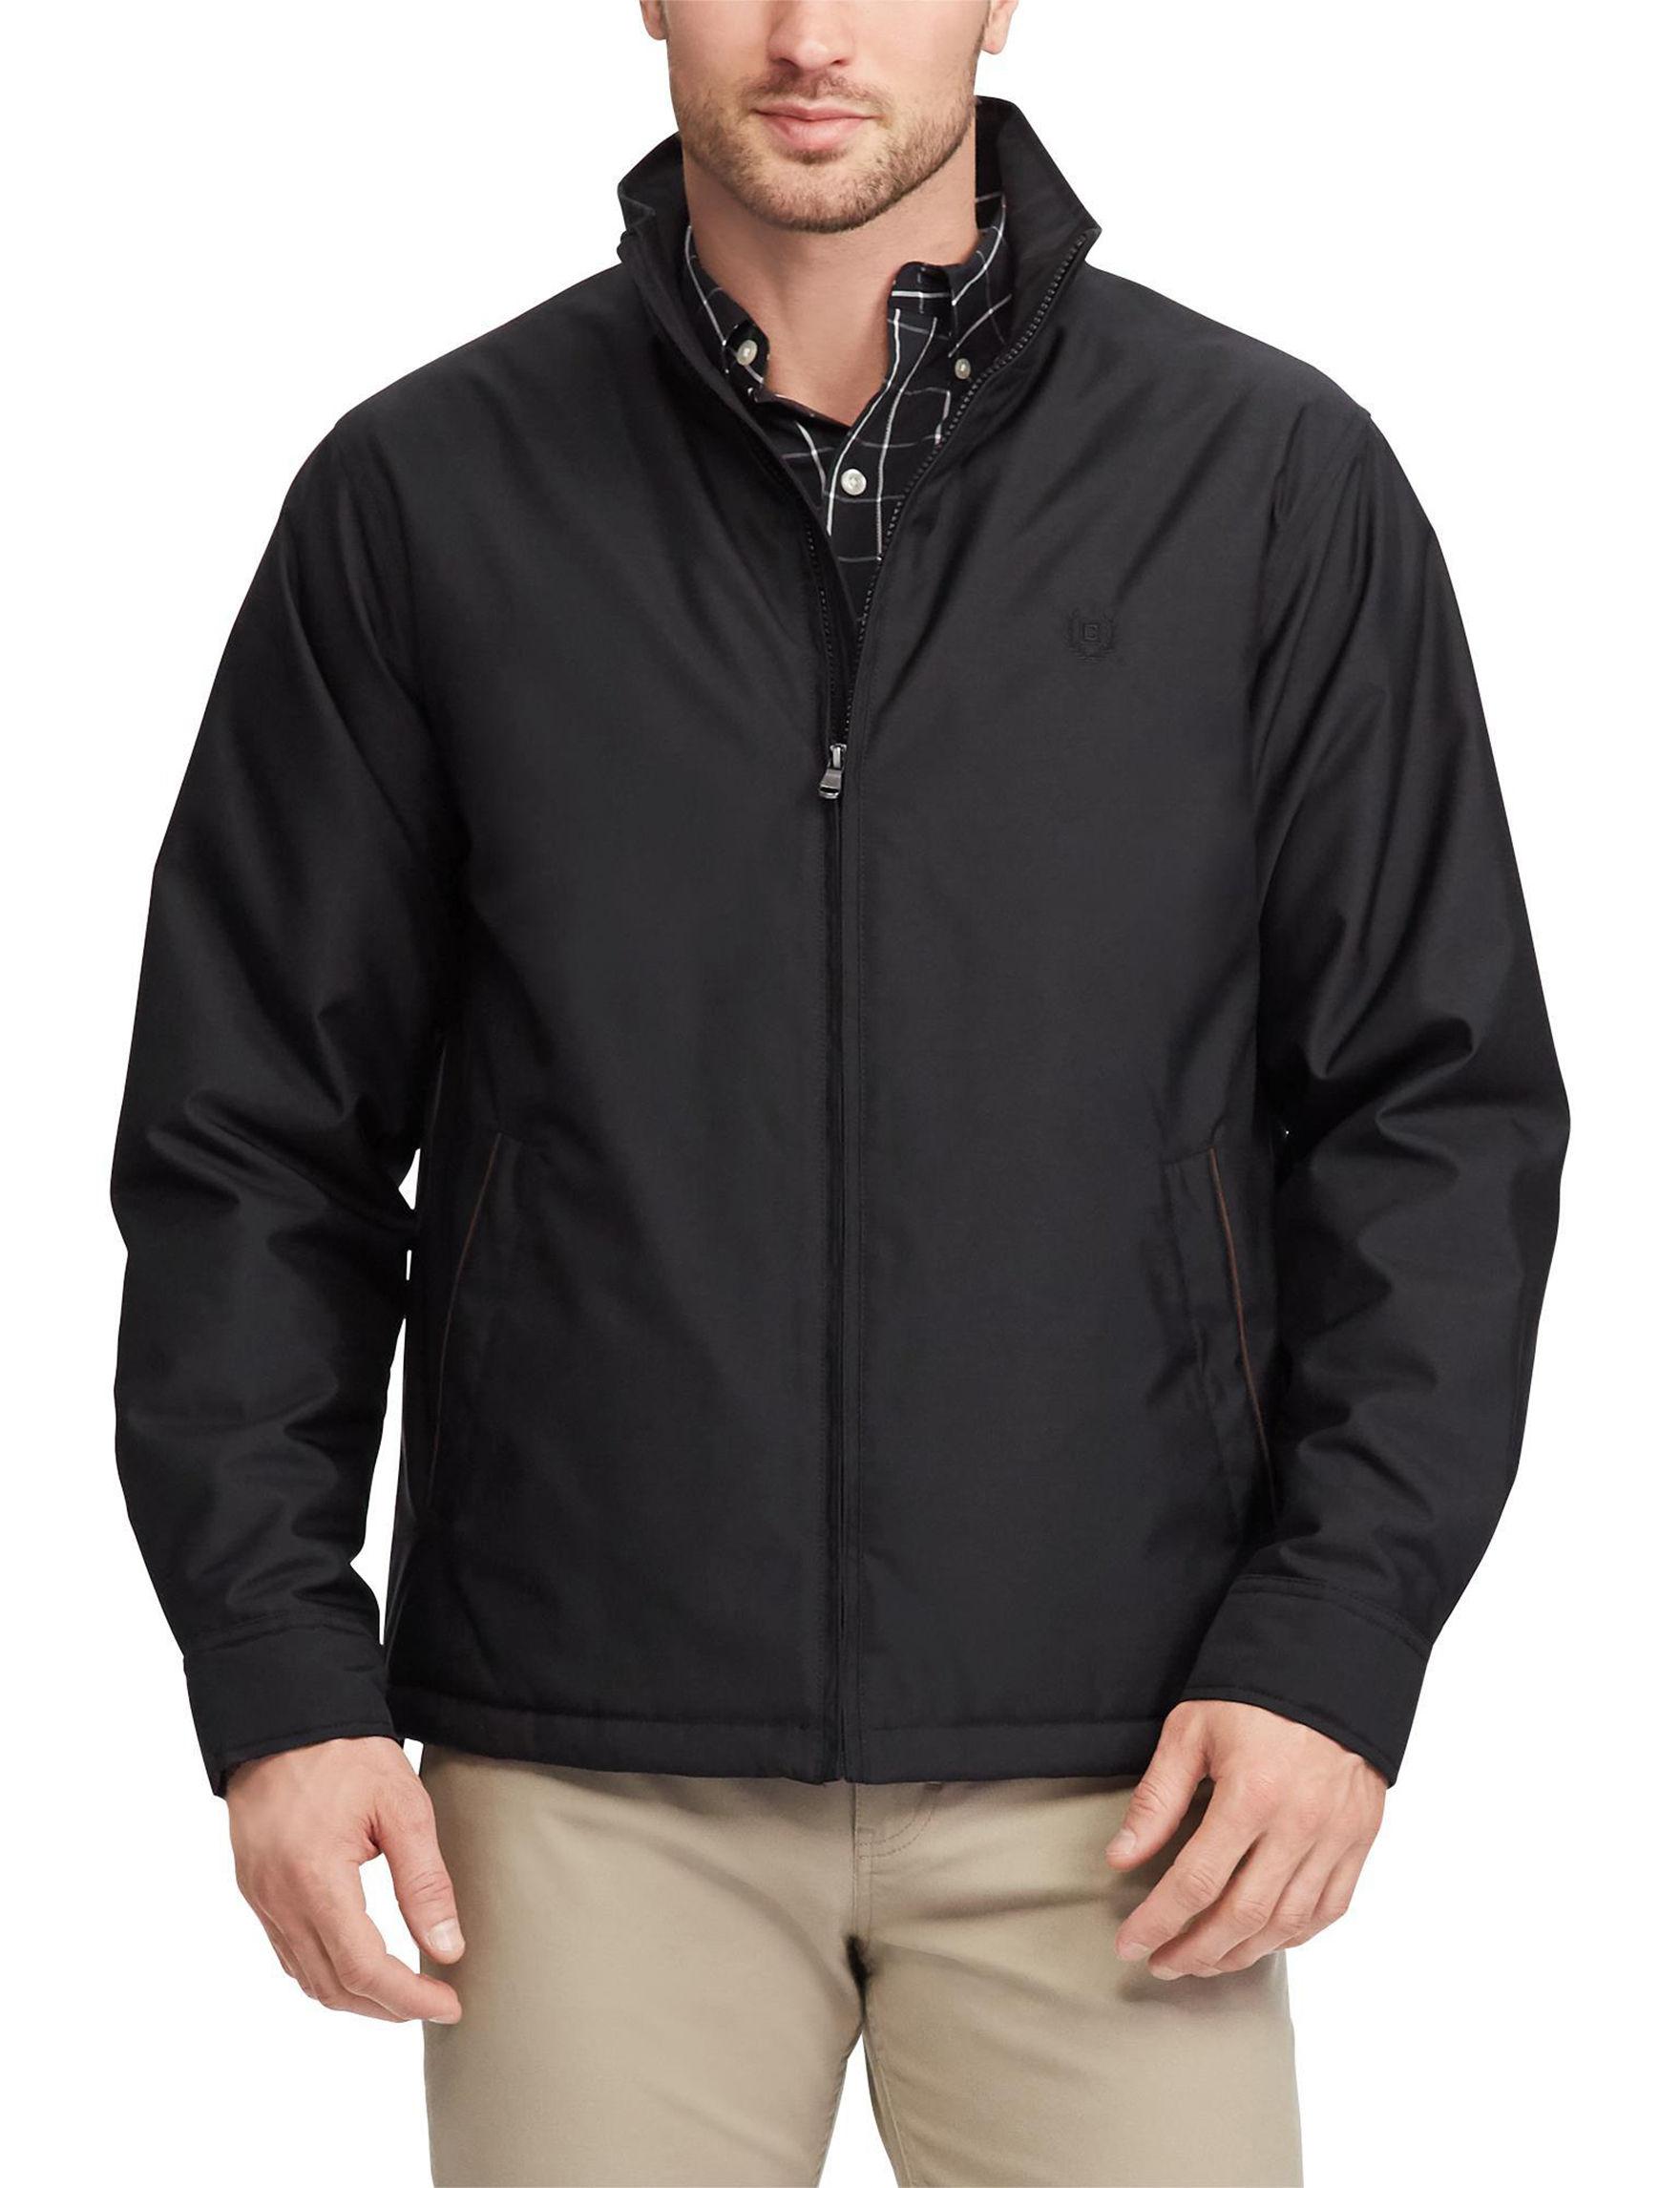 Chaps Black Fleece & Soft Shell Jackets